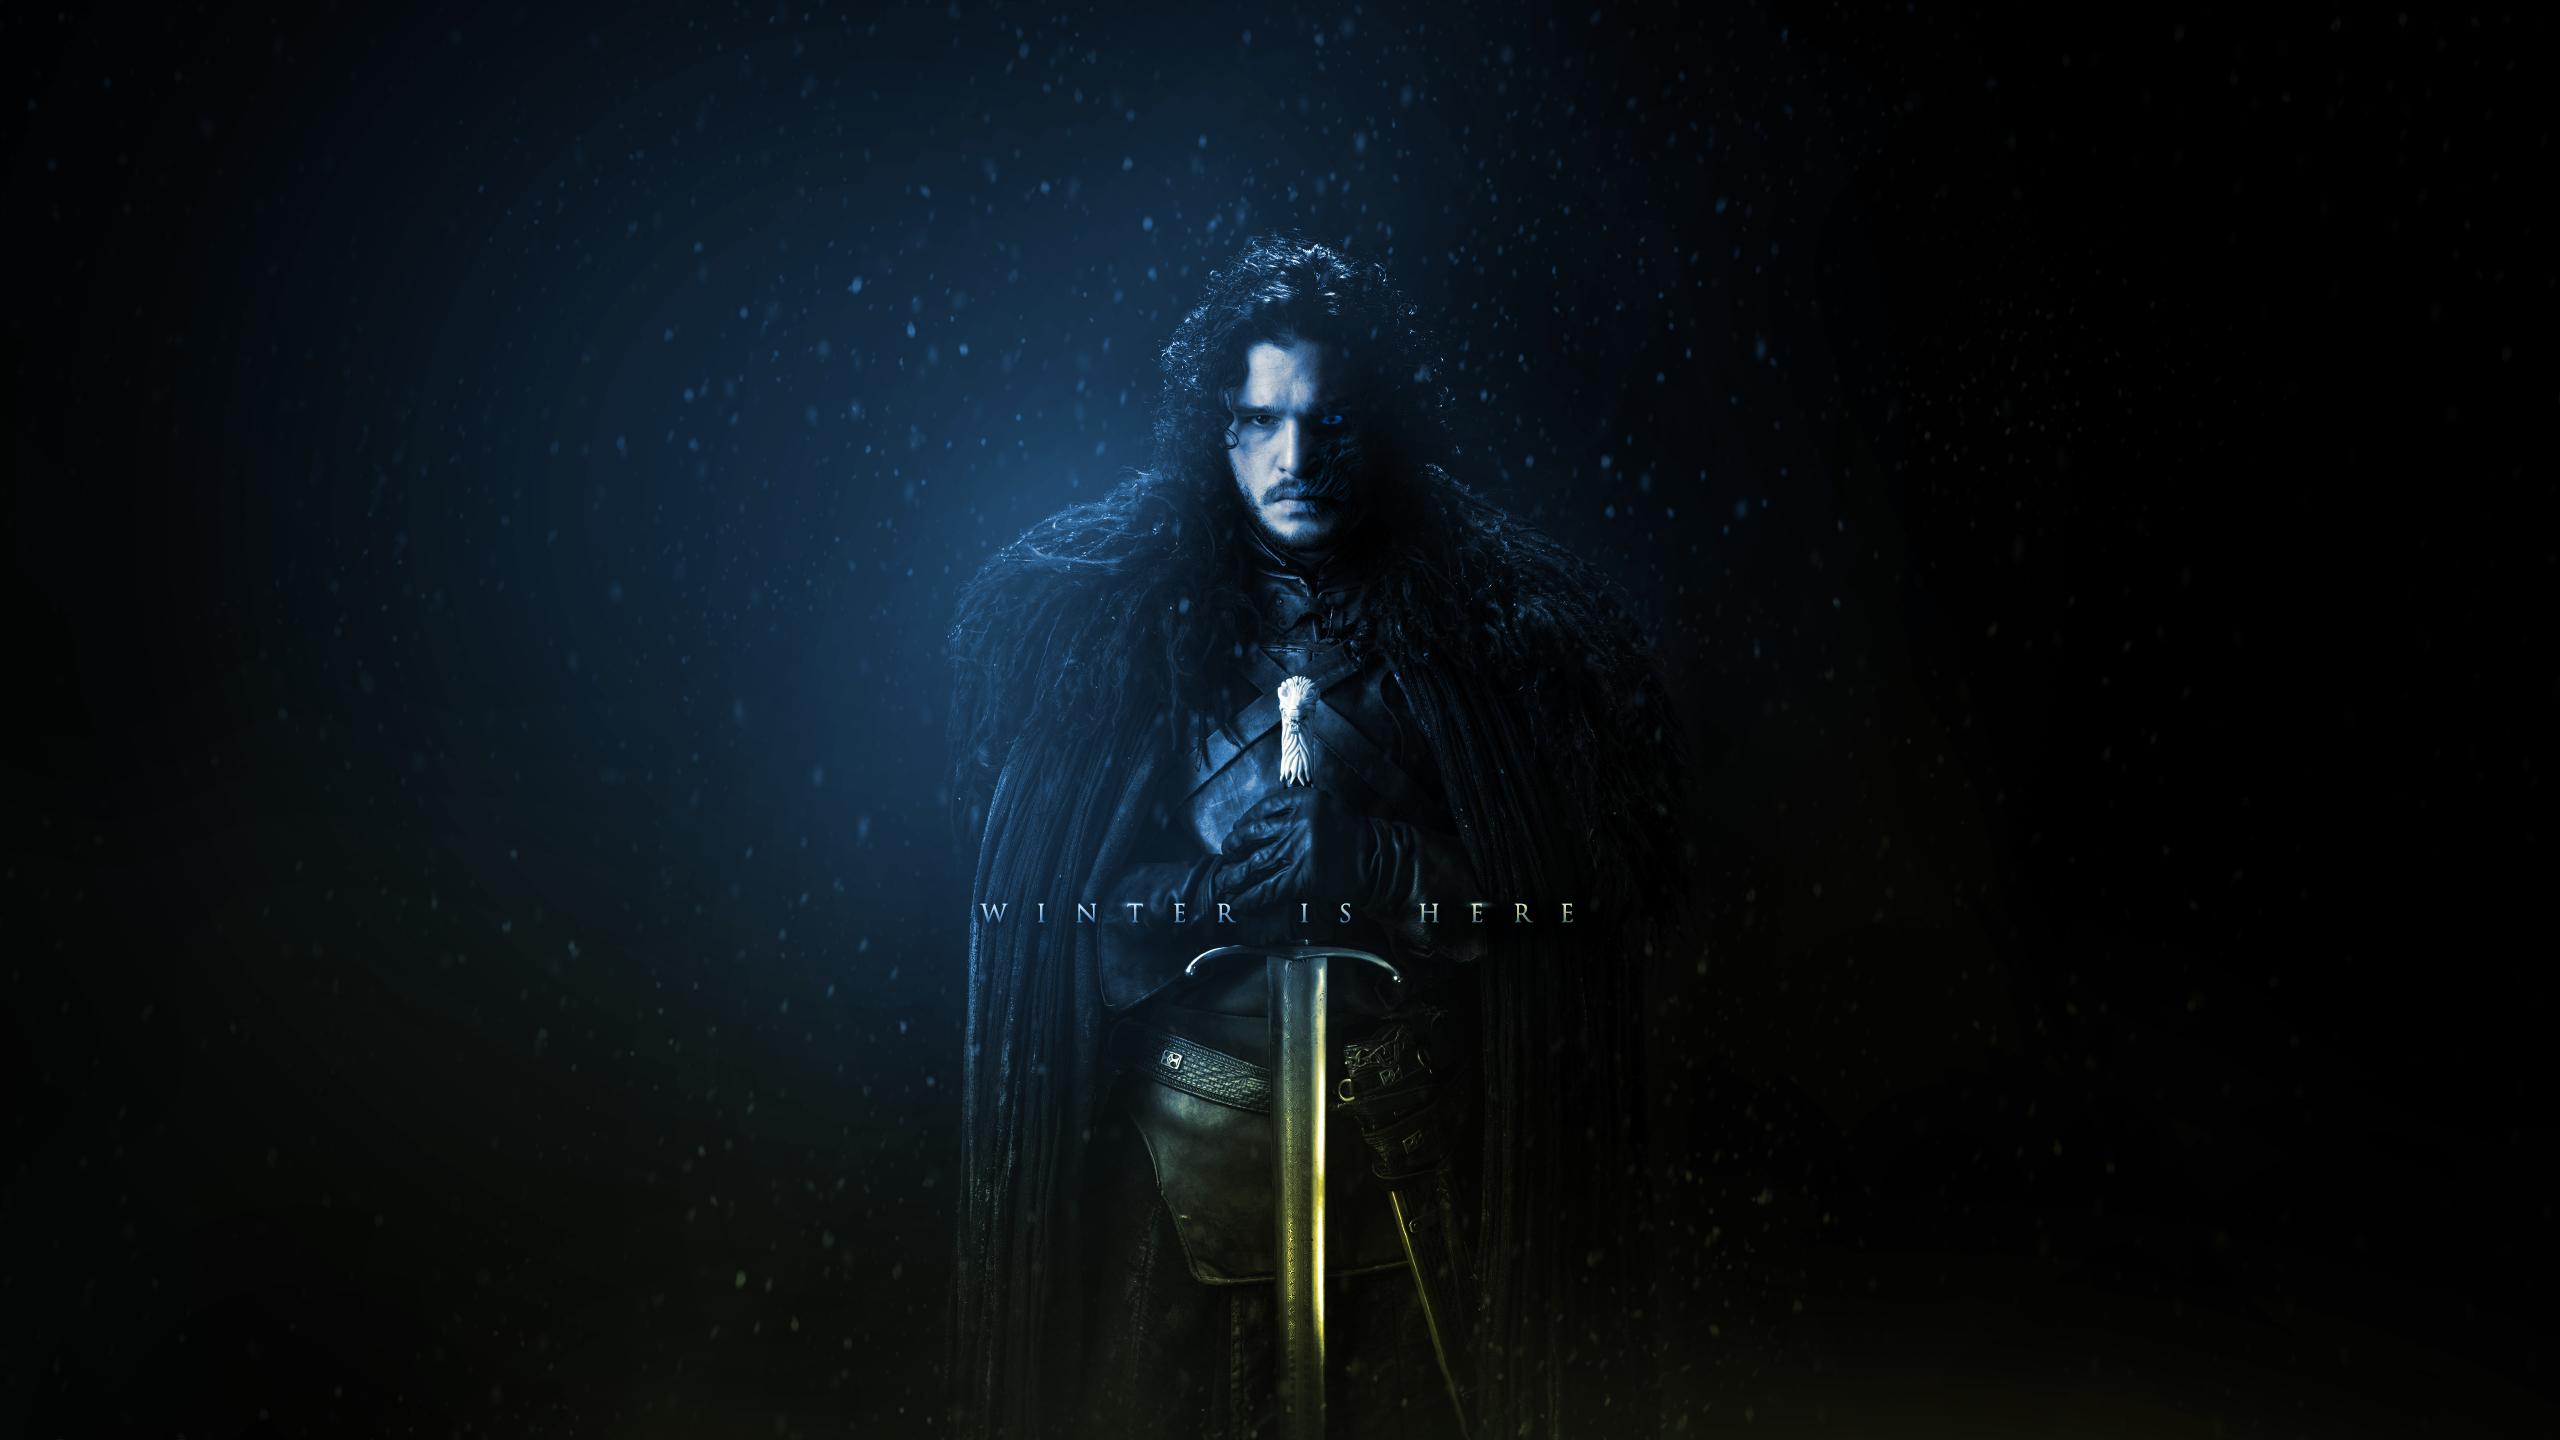 Game Of Thrones Wallpaper Jon Snow By Rocklou On Deviantart